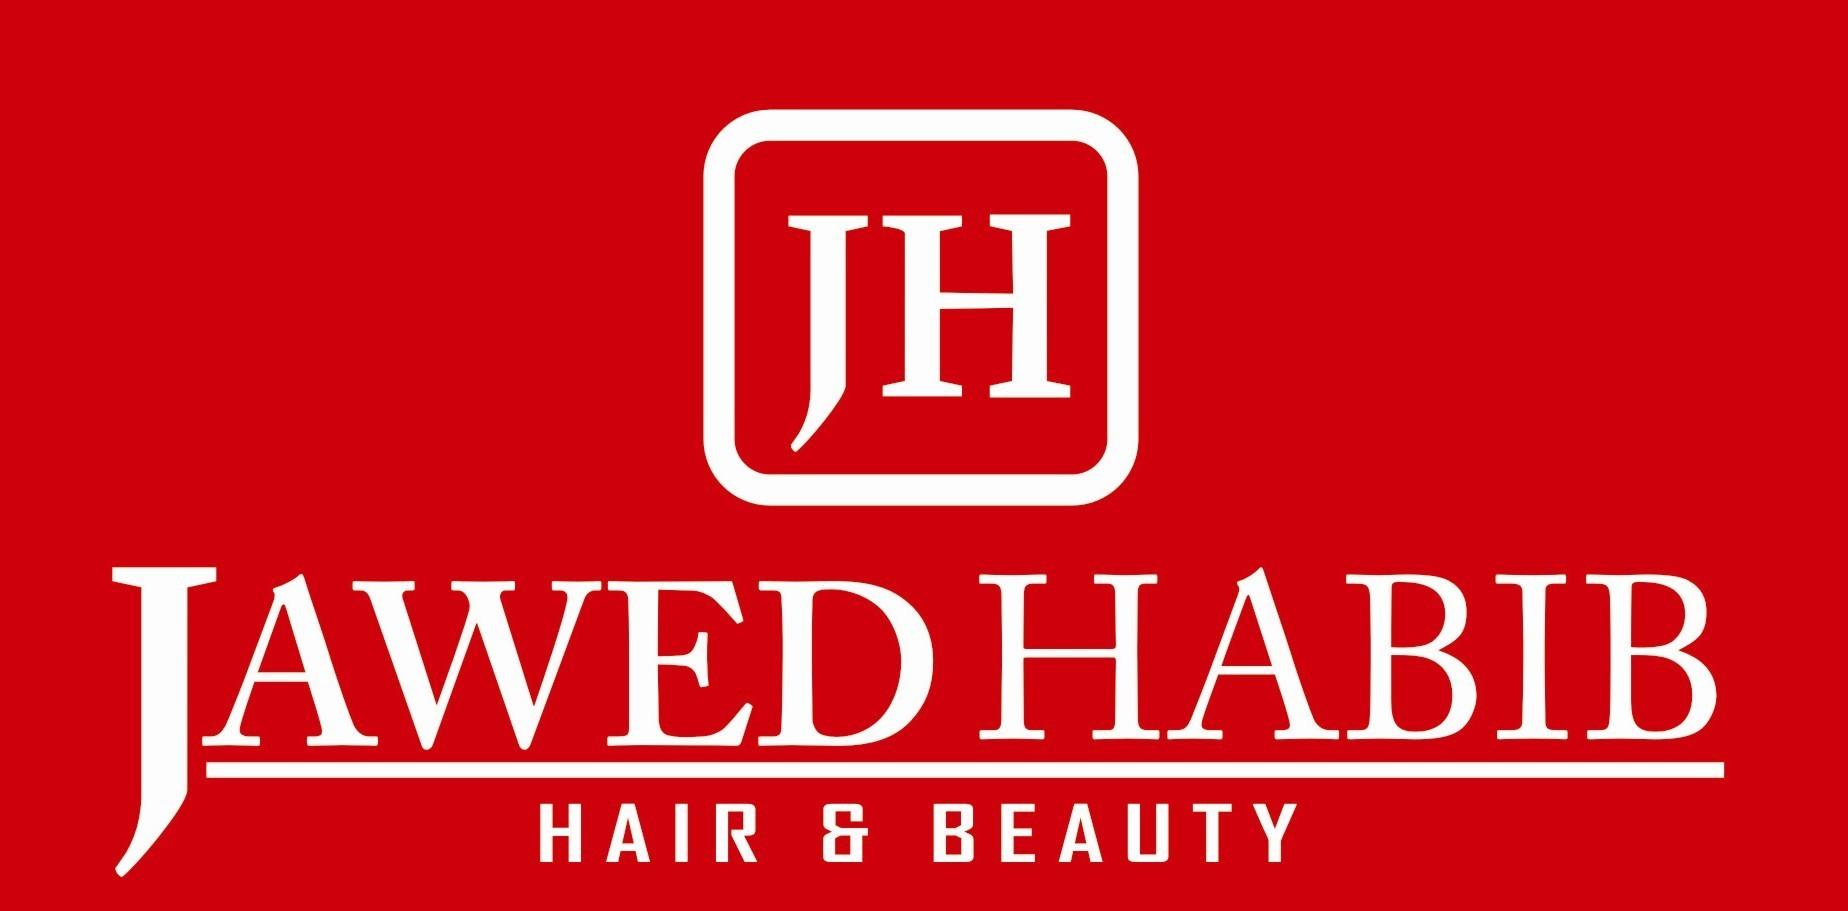 Jawed Habib Hair & Beauty Salons - Palam Vihar - Gurgaon Image